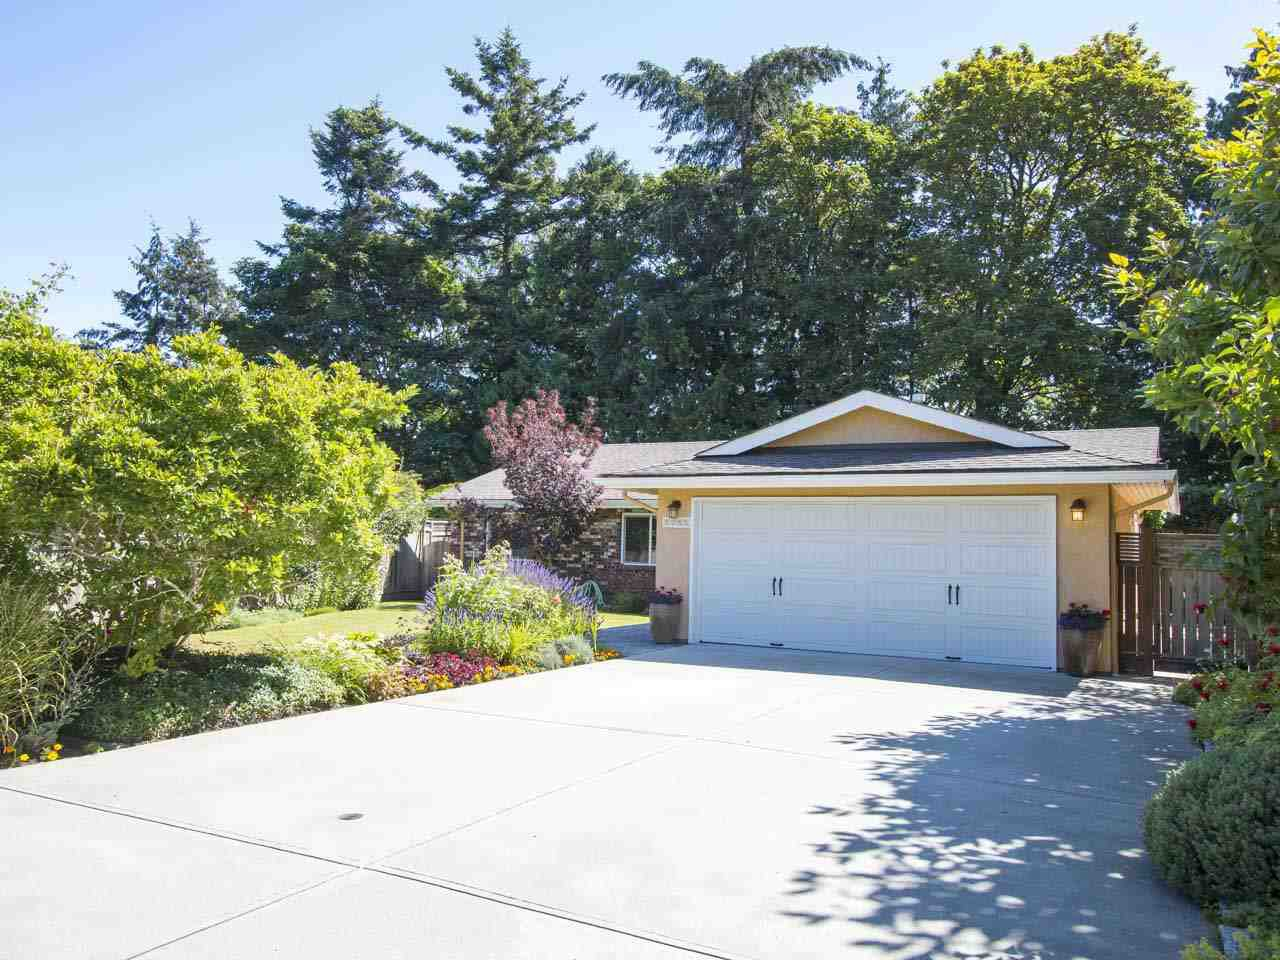 Main Photo: 5755 FERGUSON Court in Delta: Tsawwassen East House for sale (Tsawwassen)  : MLS®# R2090014